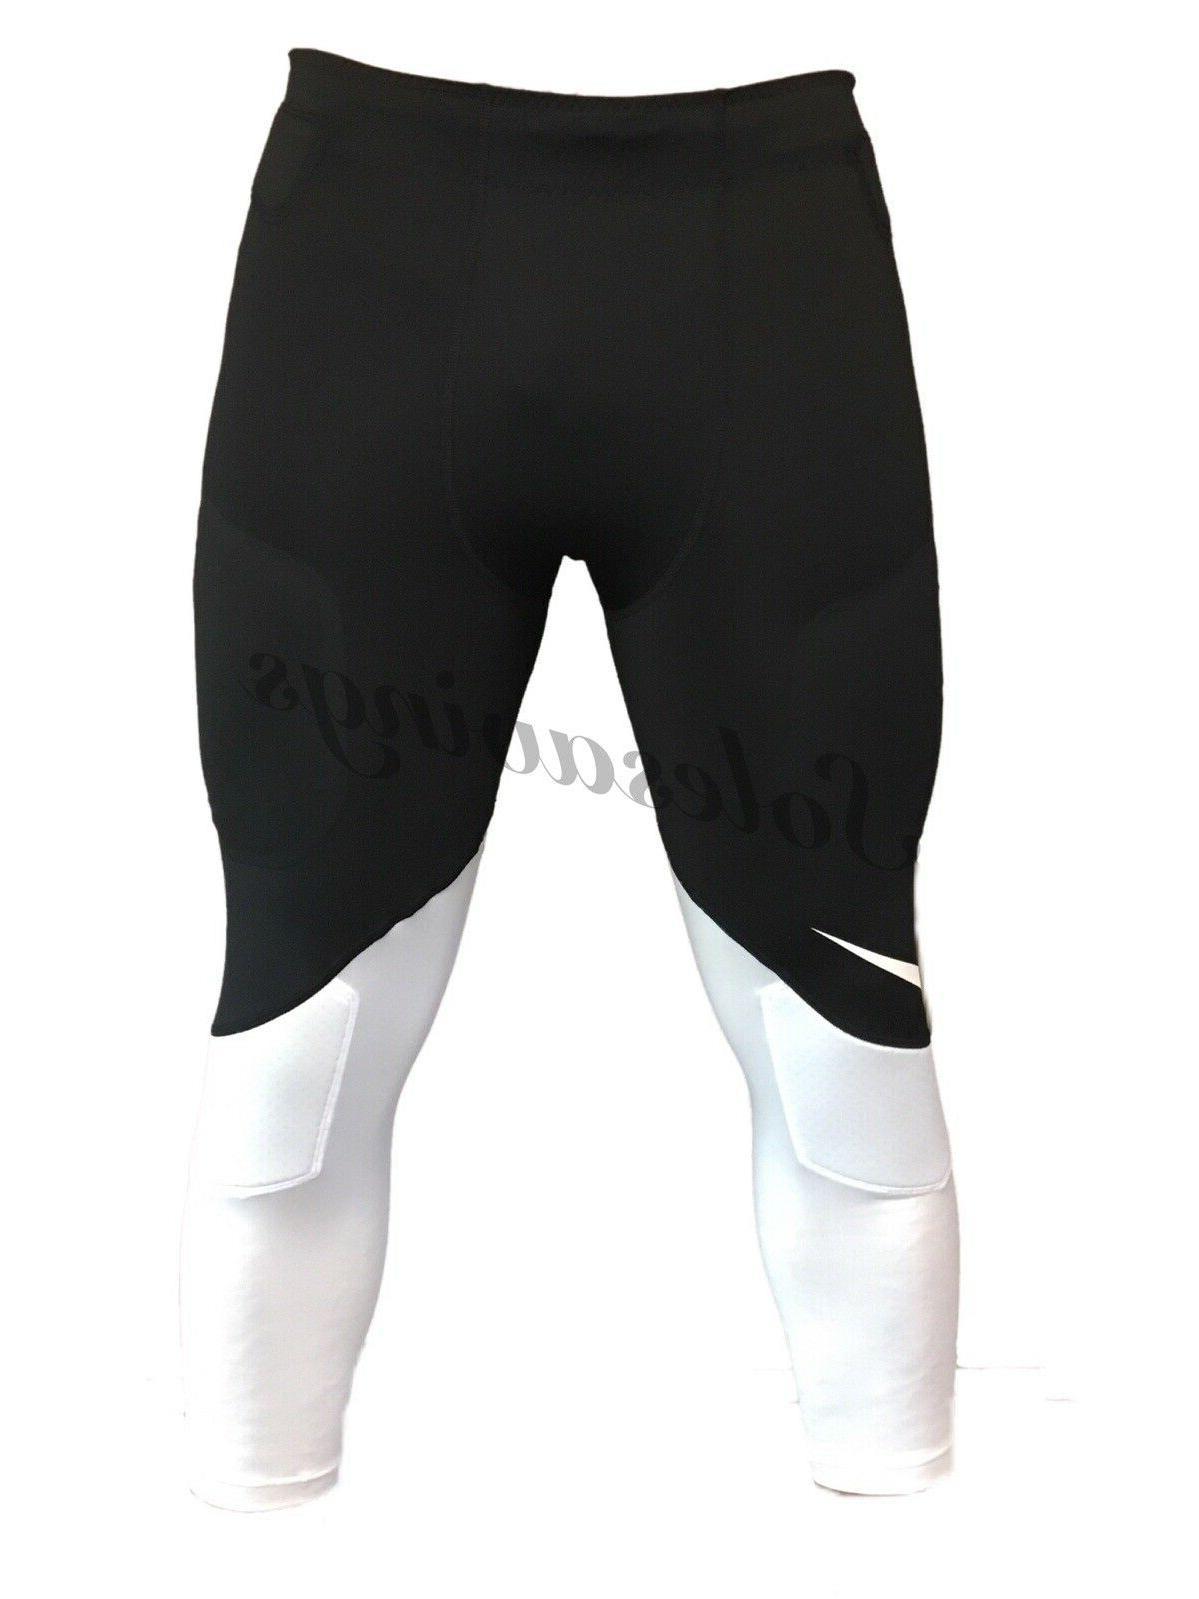 3/4 nike compression pants